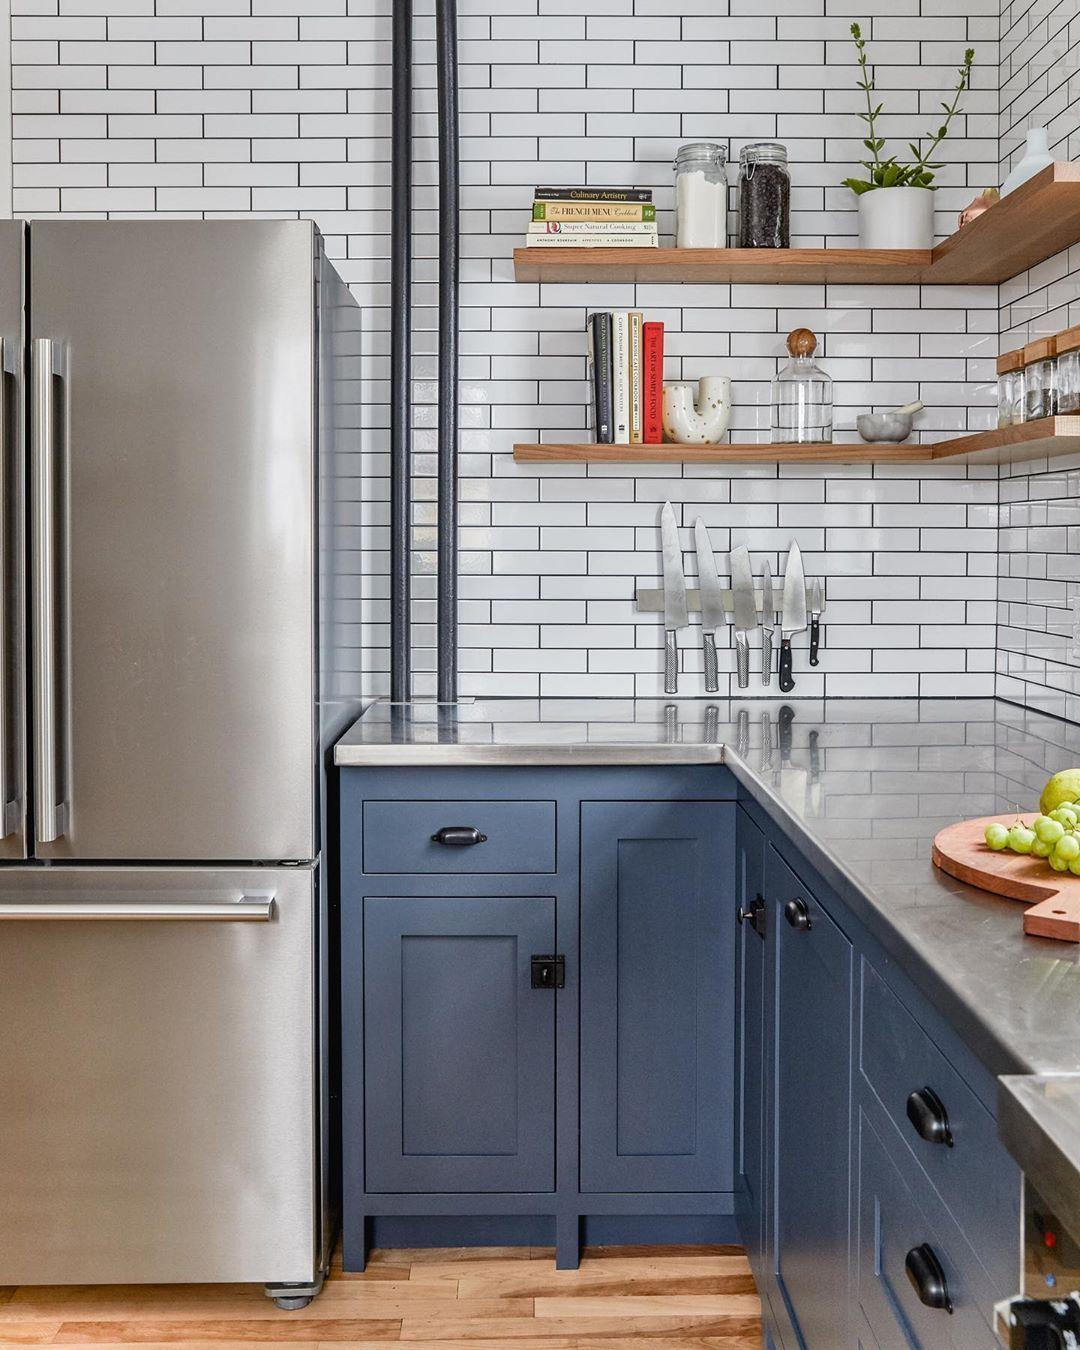 Block Brothers Custom Cabinets On Instagram A Favorite Corner Of A Favorite Kitchen Blue Steel Stainless Steel And Quartersawn White Oak En 2020